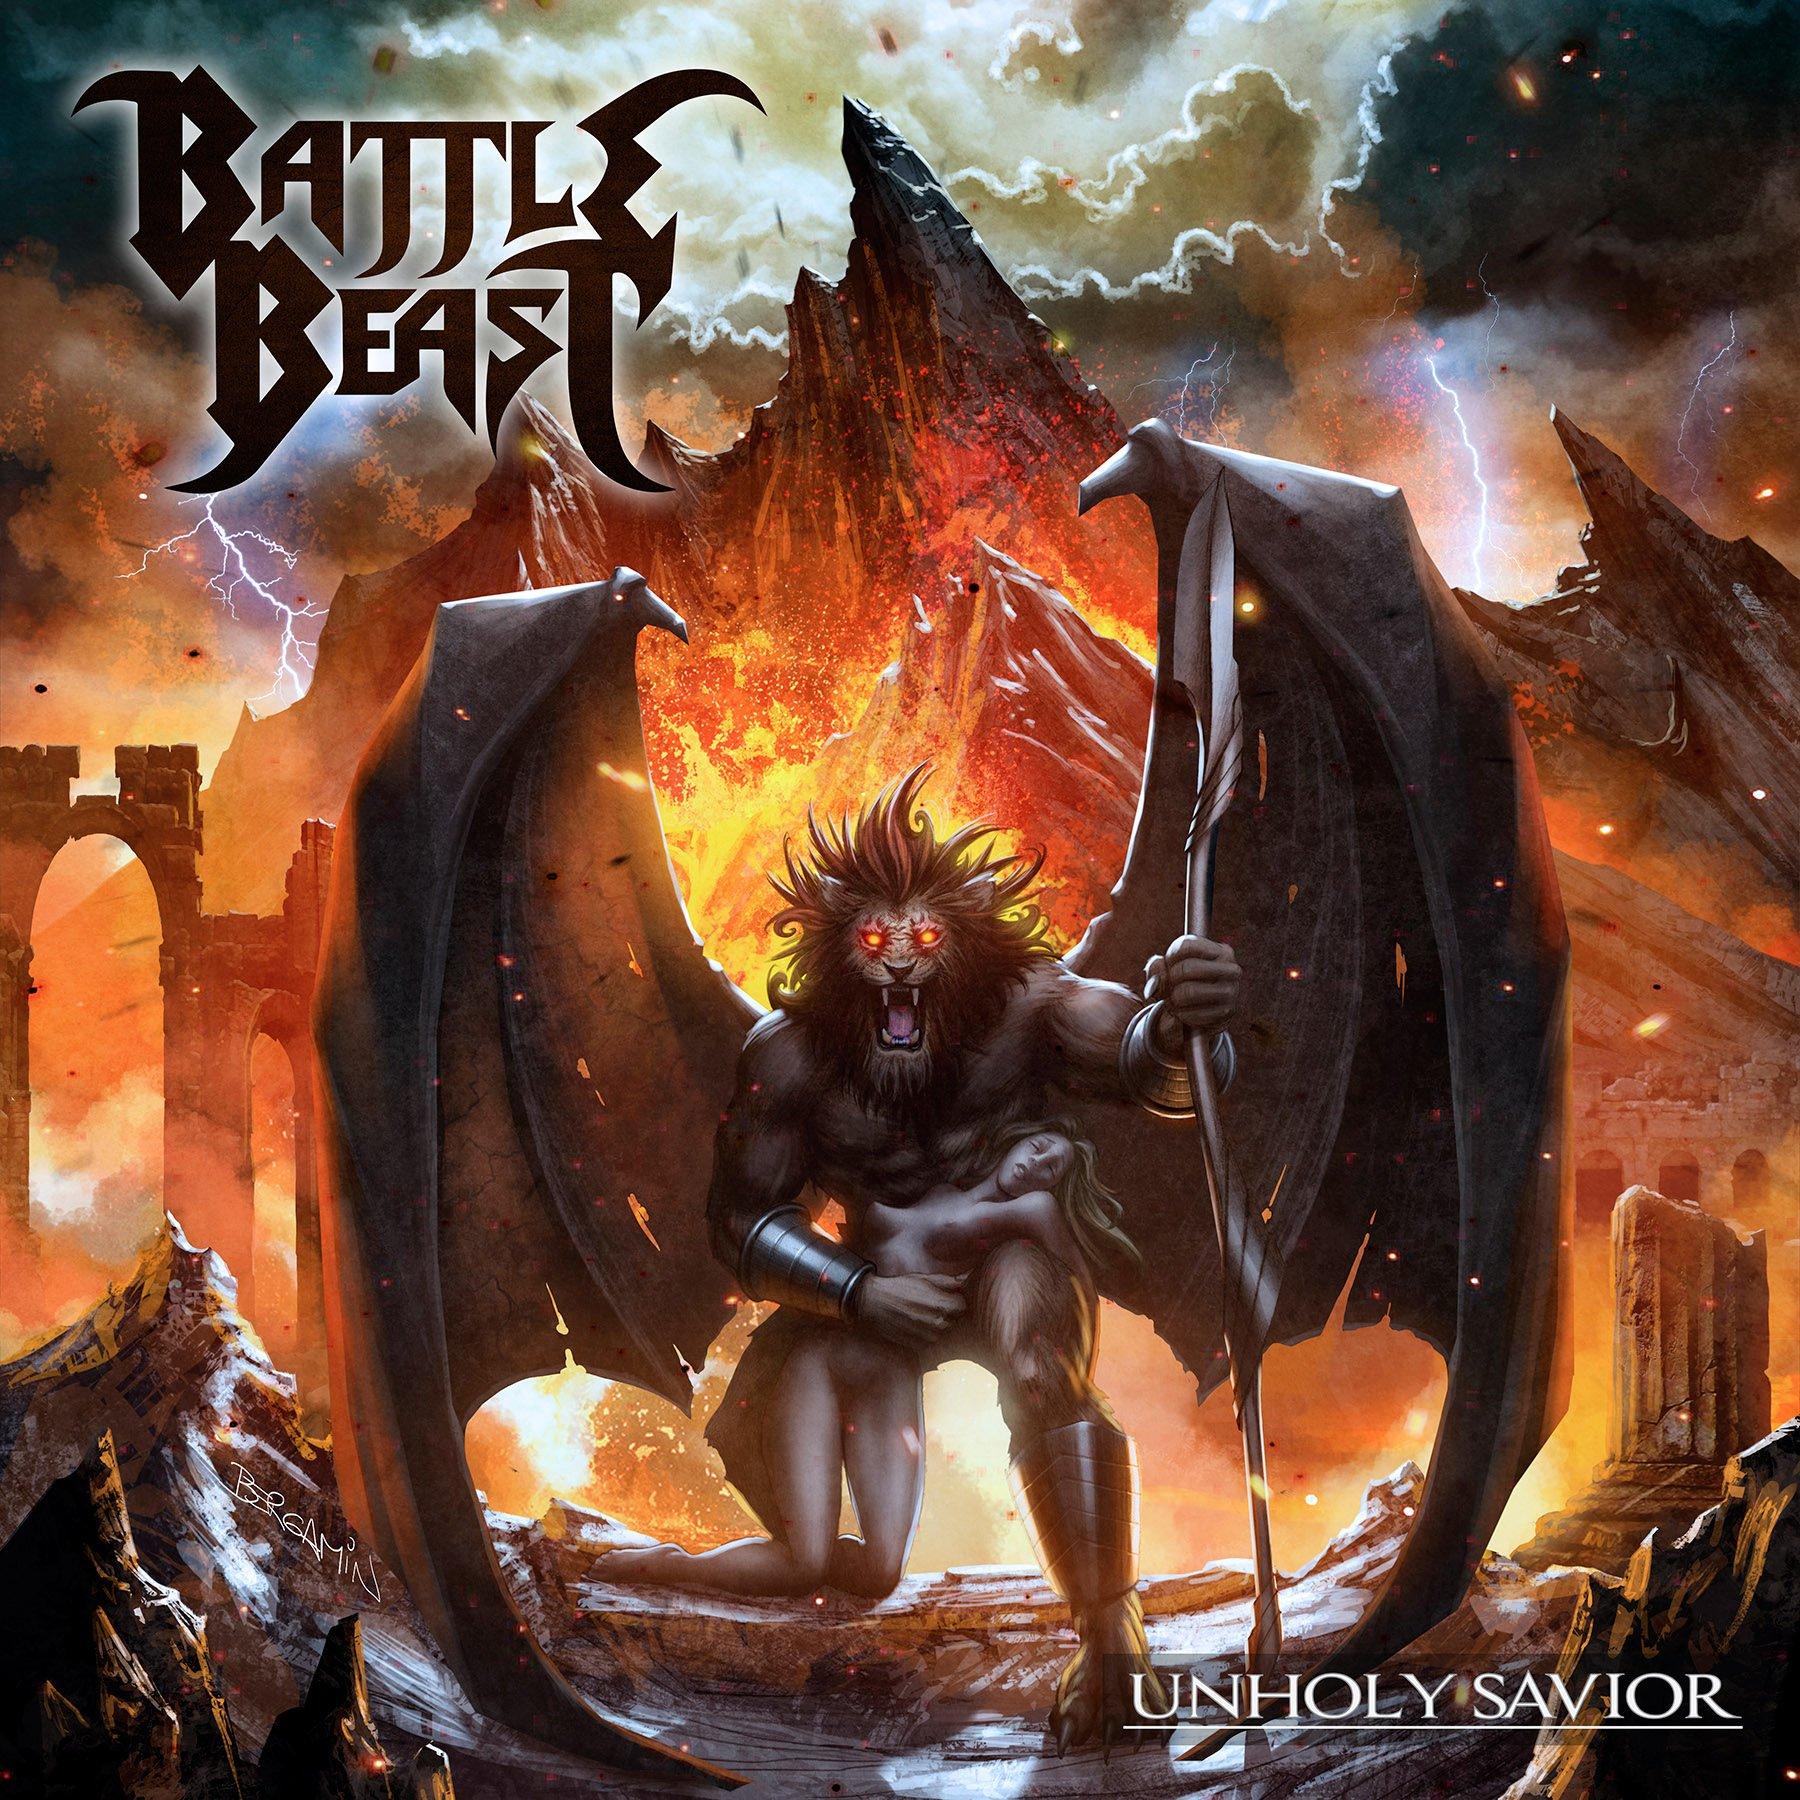 CD : Battle Beast - Unholy Savior (CD)